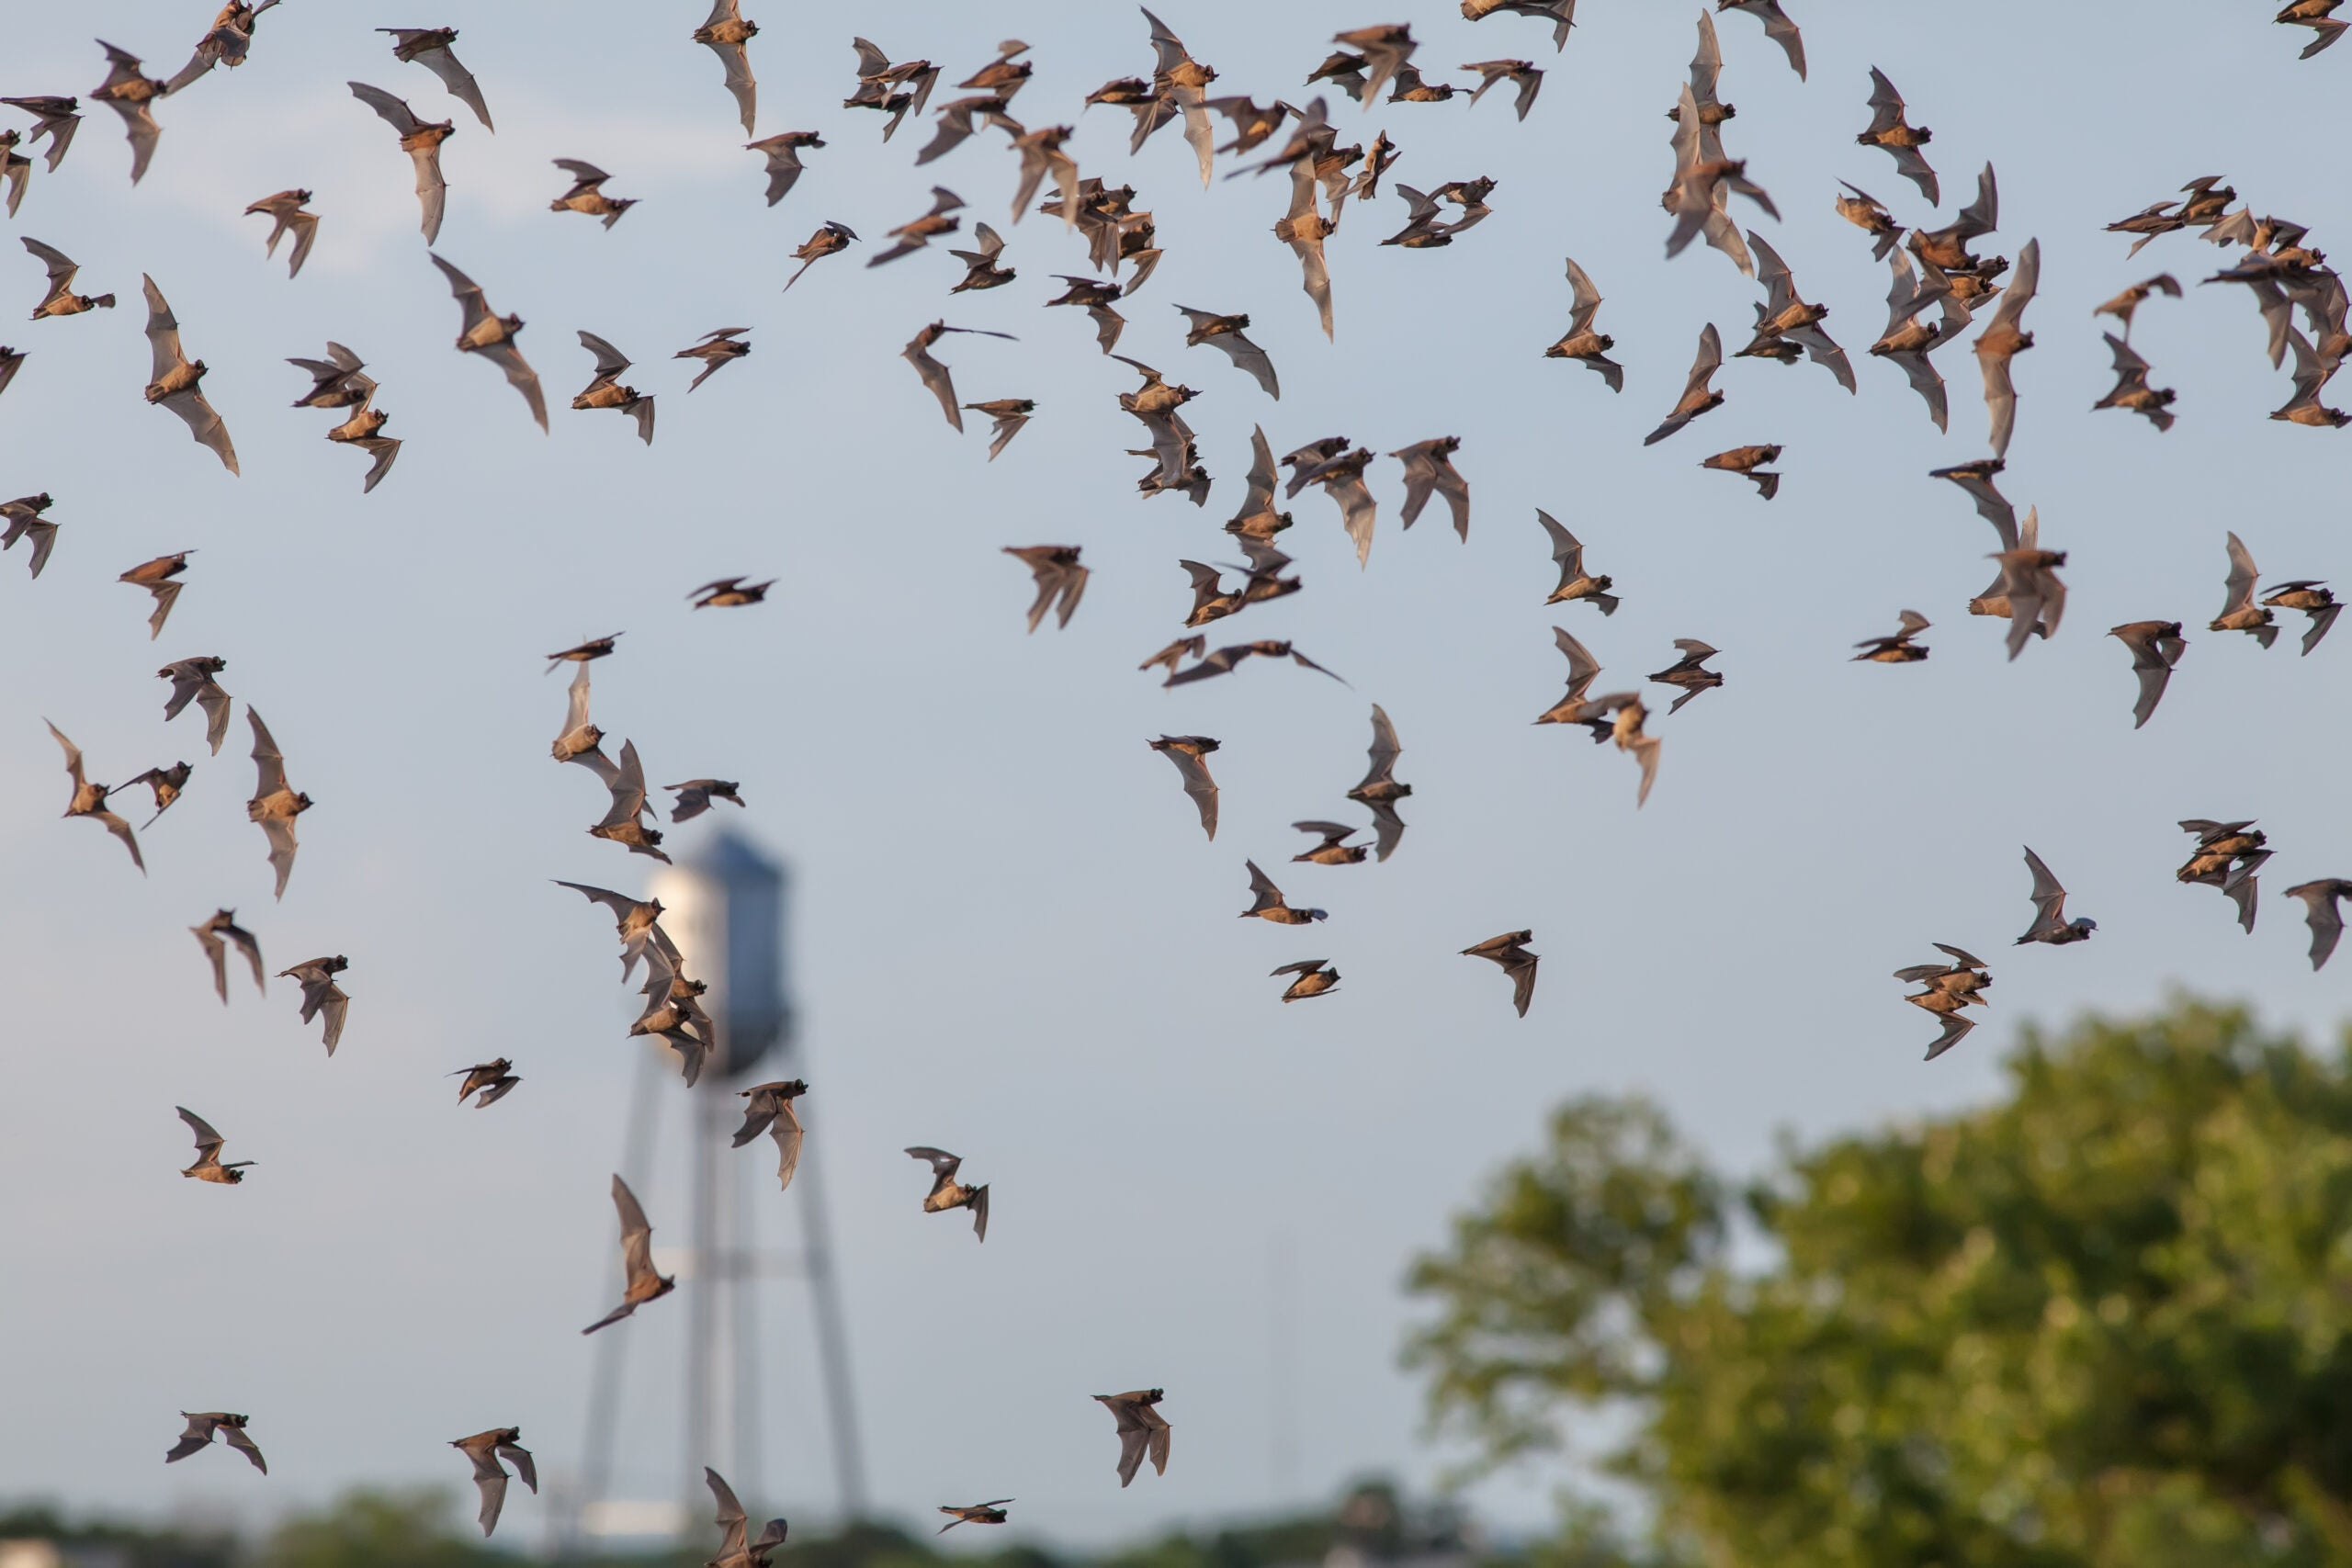 Bats Are Worth $1 Billion To Corn Industry